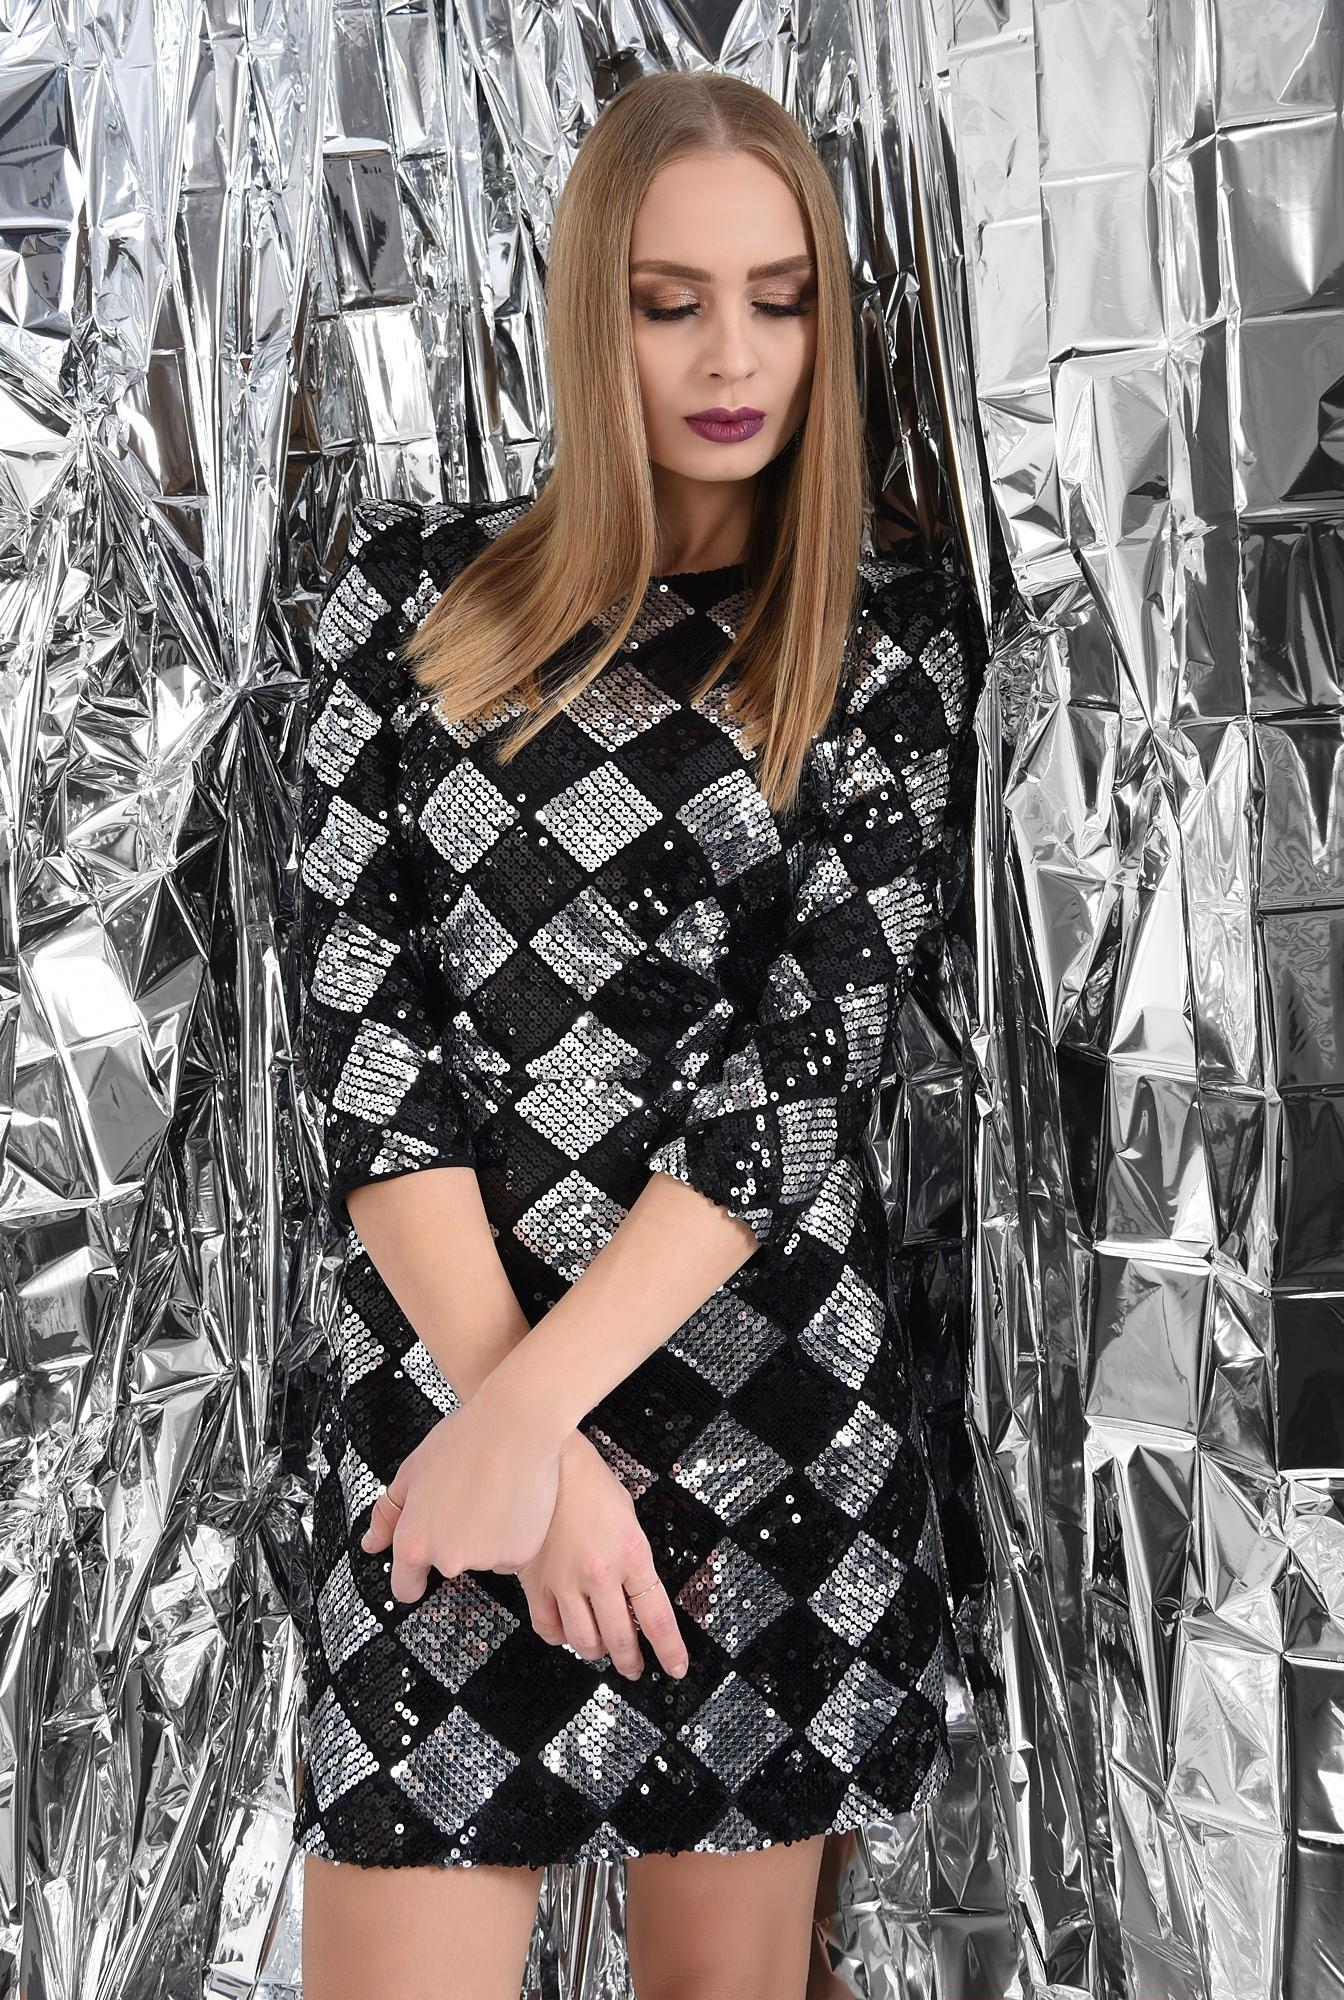 rochie de ocazie, mini, din paiete, neagra, argintie, romburi, croi cambrat